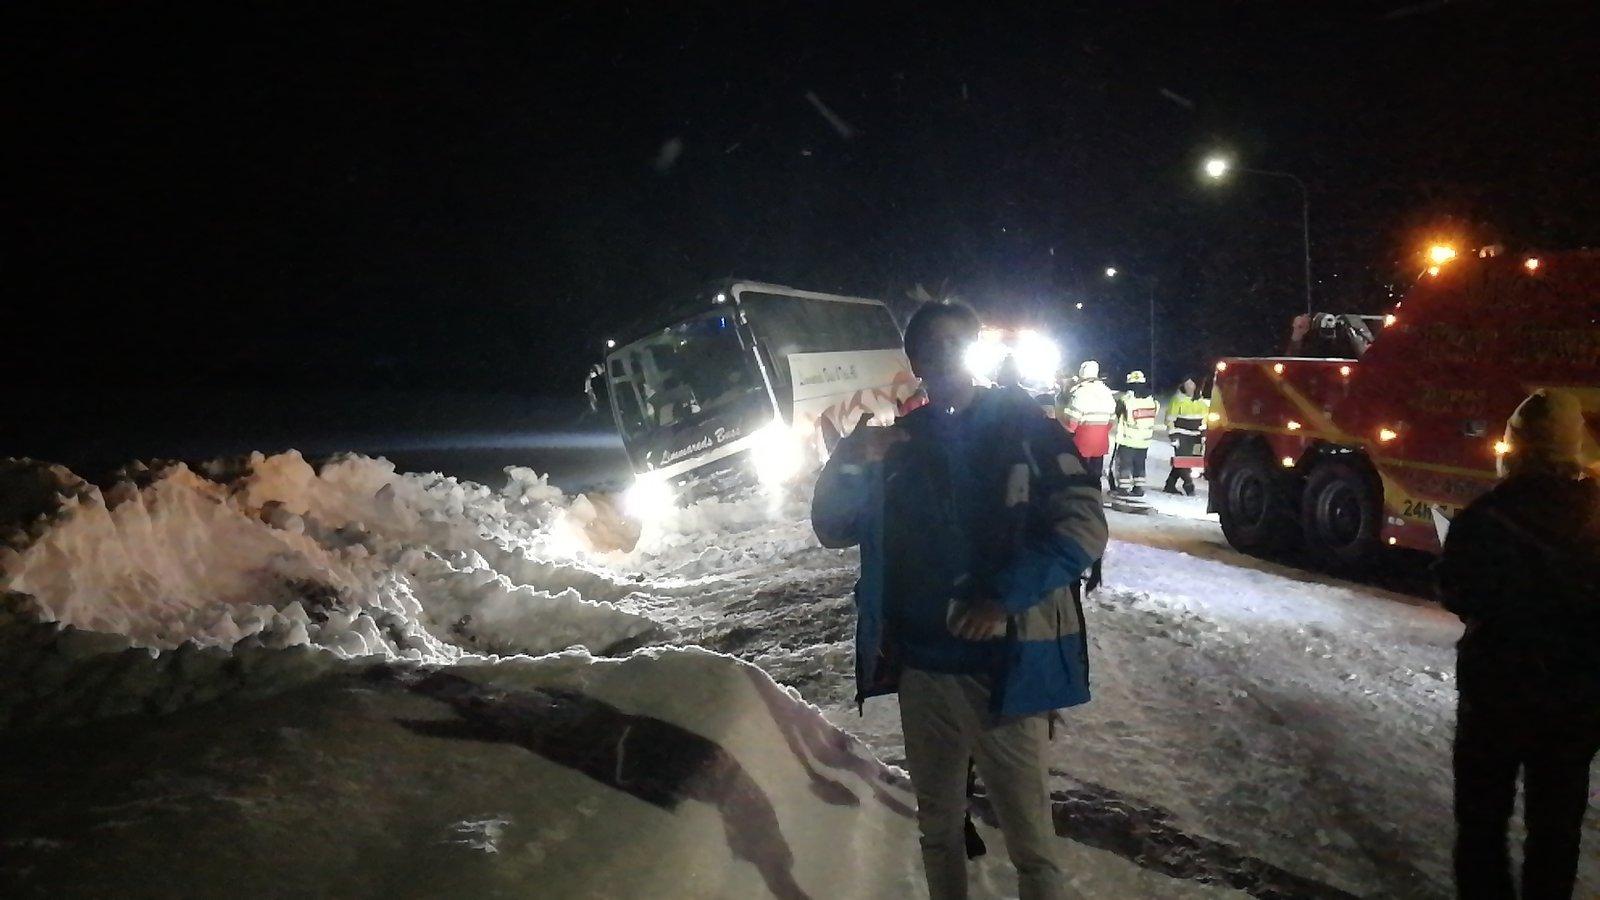 Buss crash